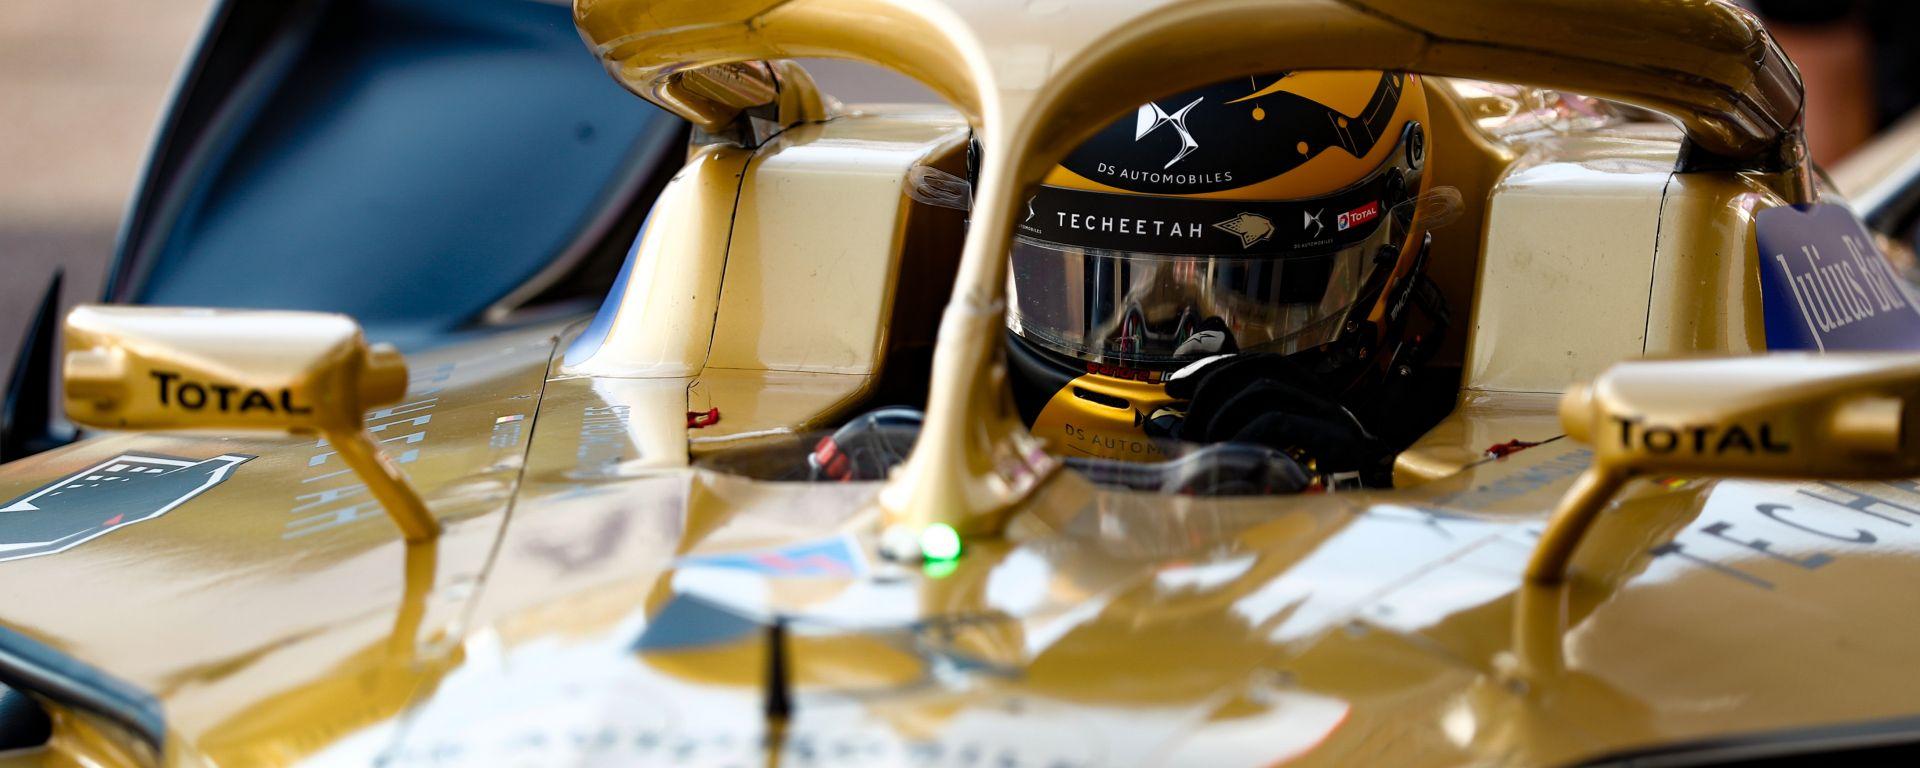 ePrix Monaco 2019, André Lotterer a bordo della sua Ds Techeetah